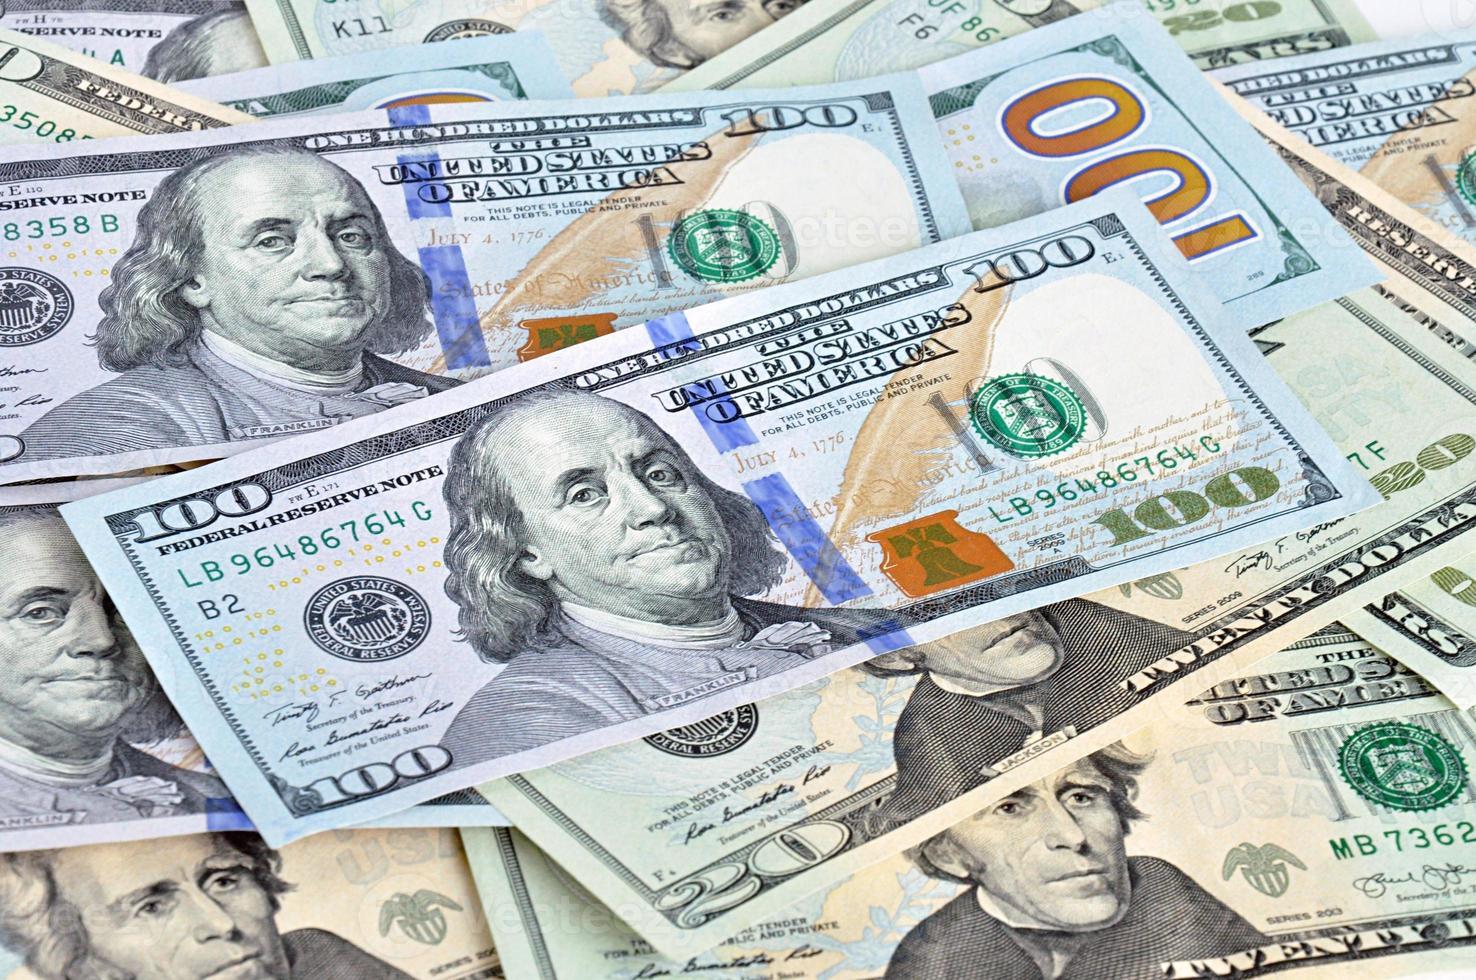 geld - Amerikaanse dollars (usd) rekeningen foto